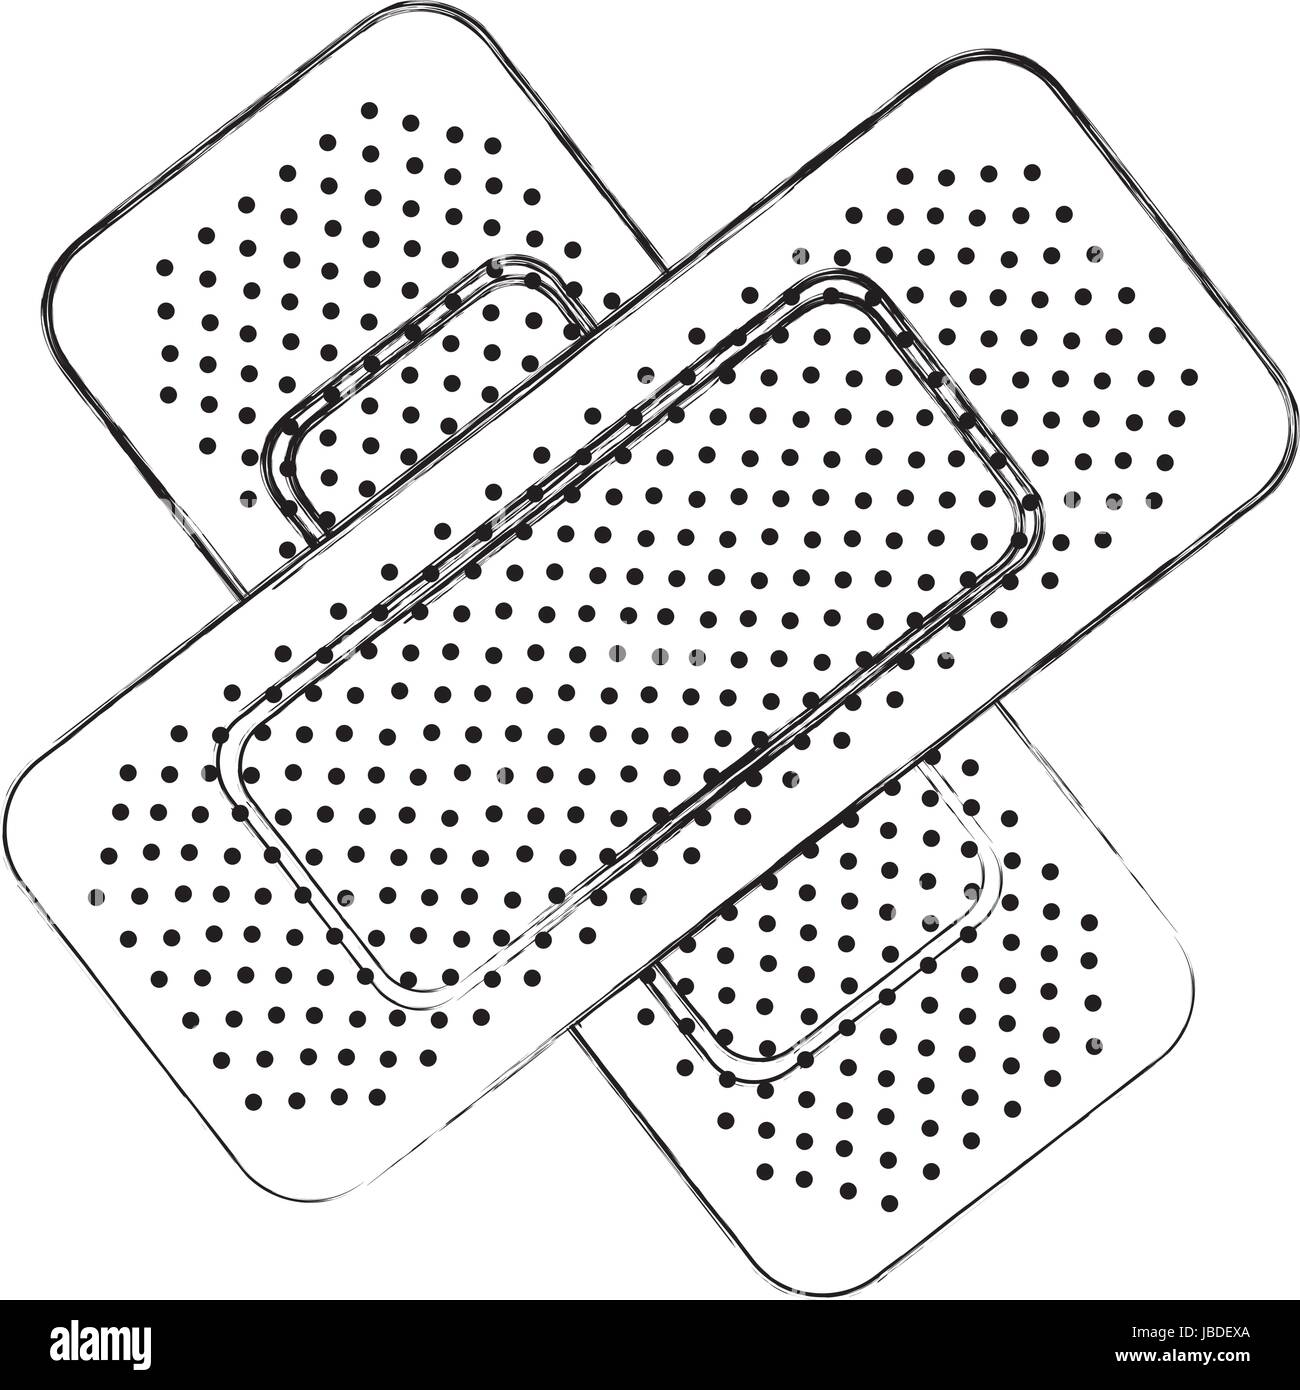 Sketch Of Accident Stockfotos & Sketch Of Accident Bilder - Alamy